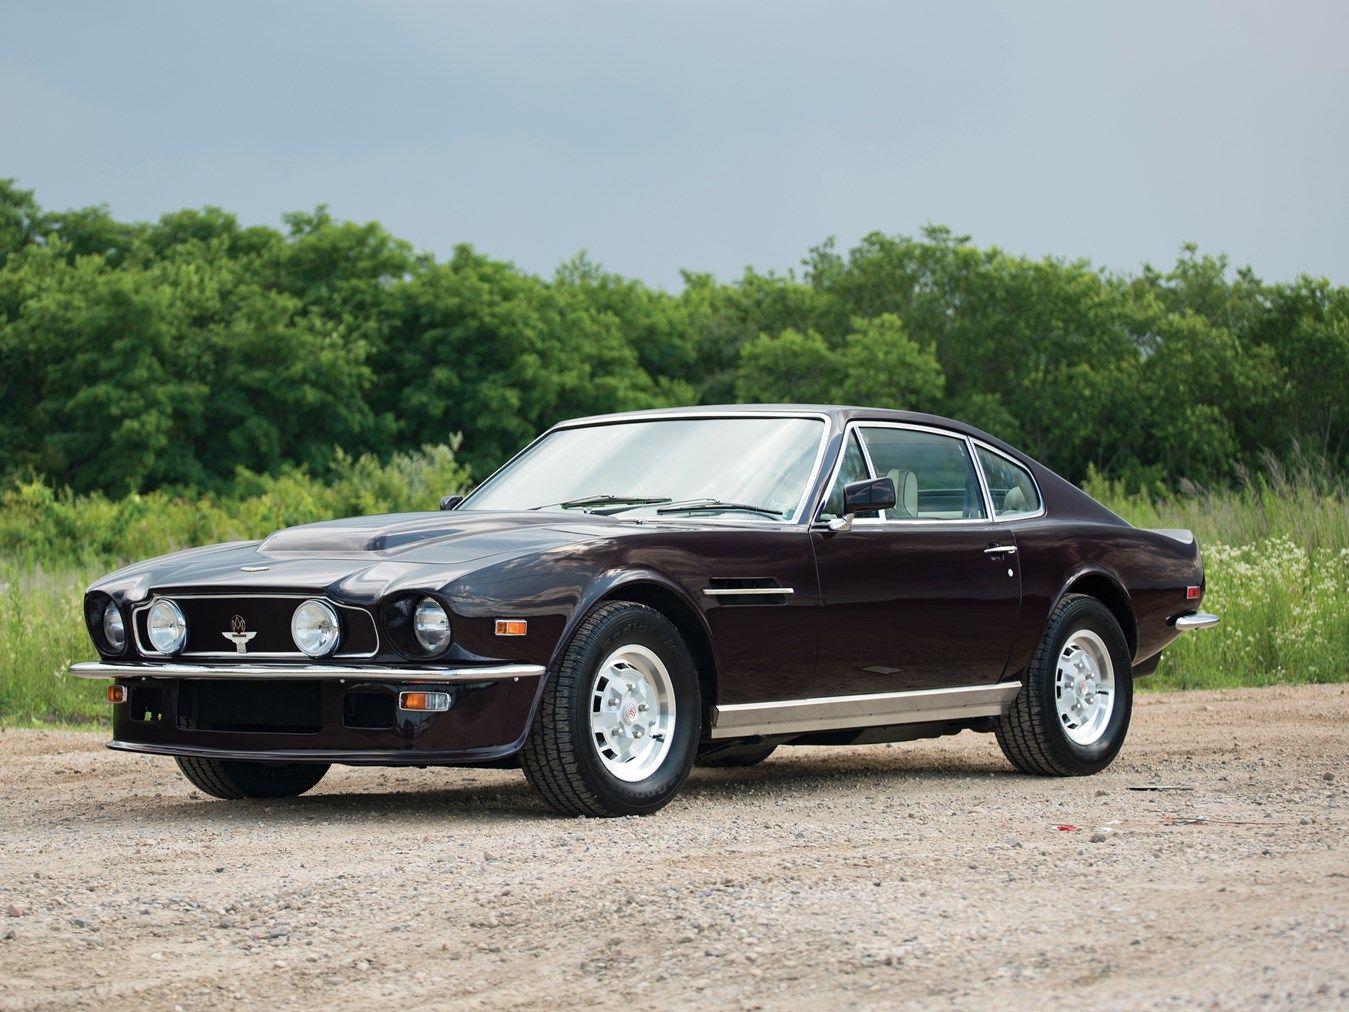 1978 Aston Martin V8 Canadian Vantage Chassis No V8 11904 Lca Engine No V 540 1904 S Aston Martin V8 Aston Aston Martin